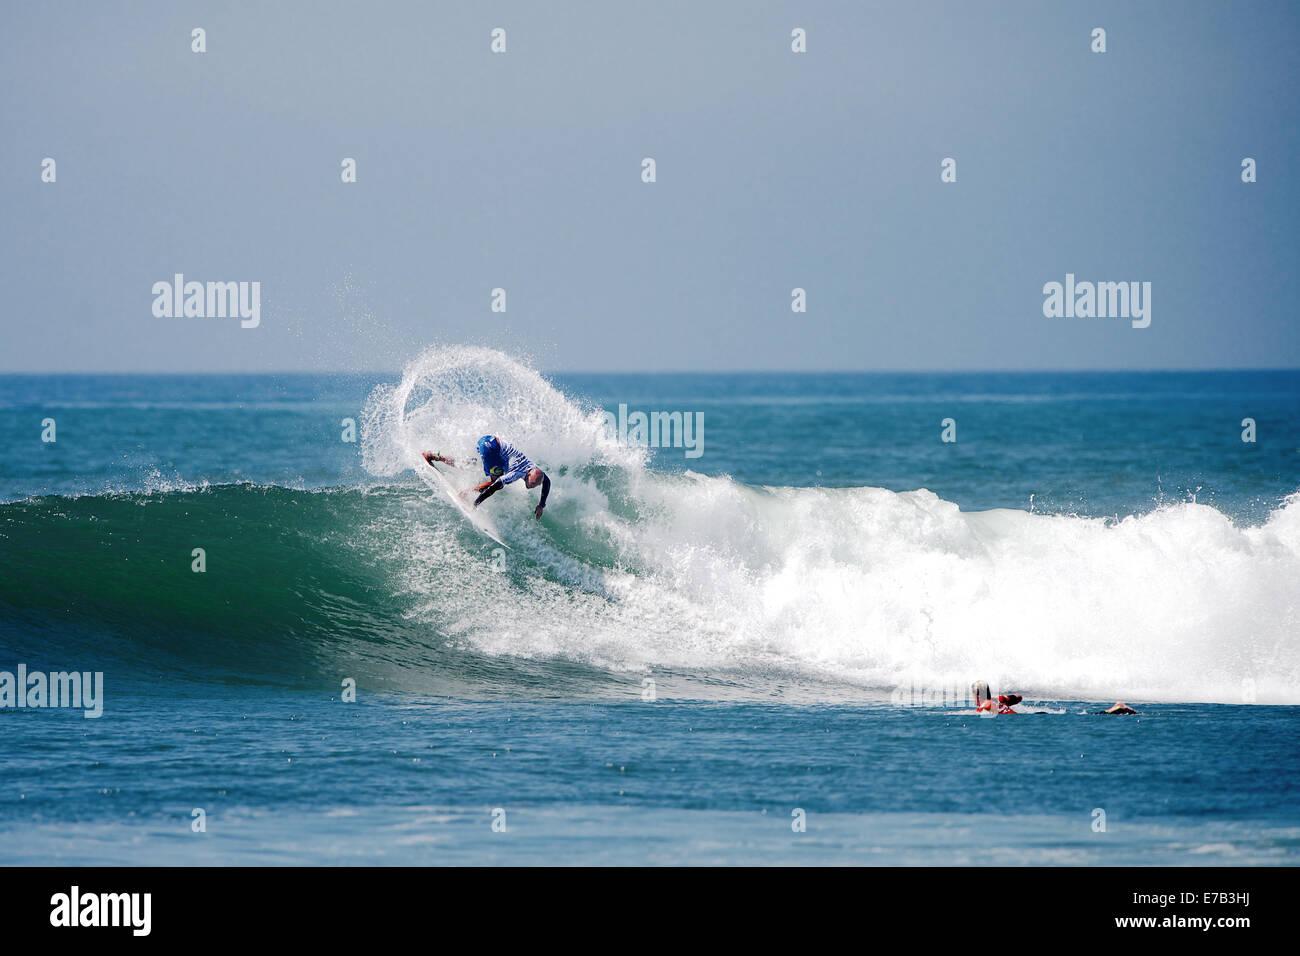 San Clemente, Californie, USA. 11 Septembre, 2014. Chemises hawaïennes pro surfer Freddy Patacchia Jr. powered Photo Stock